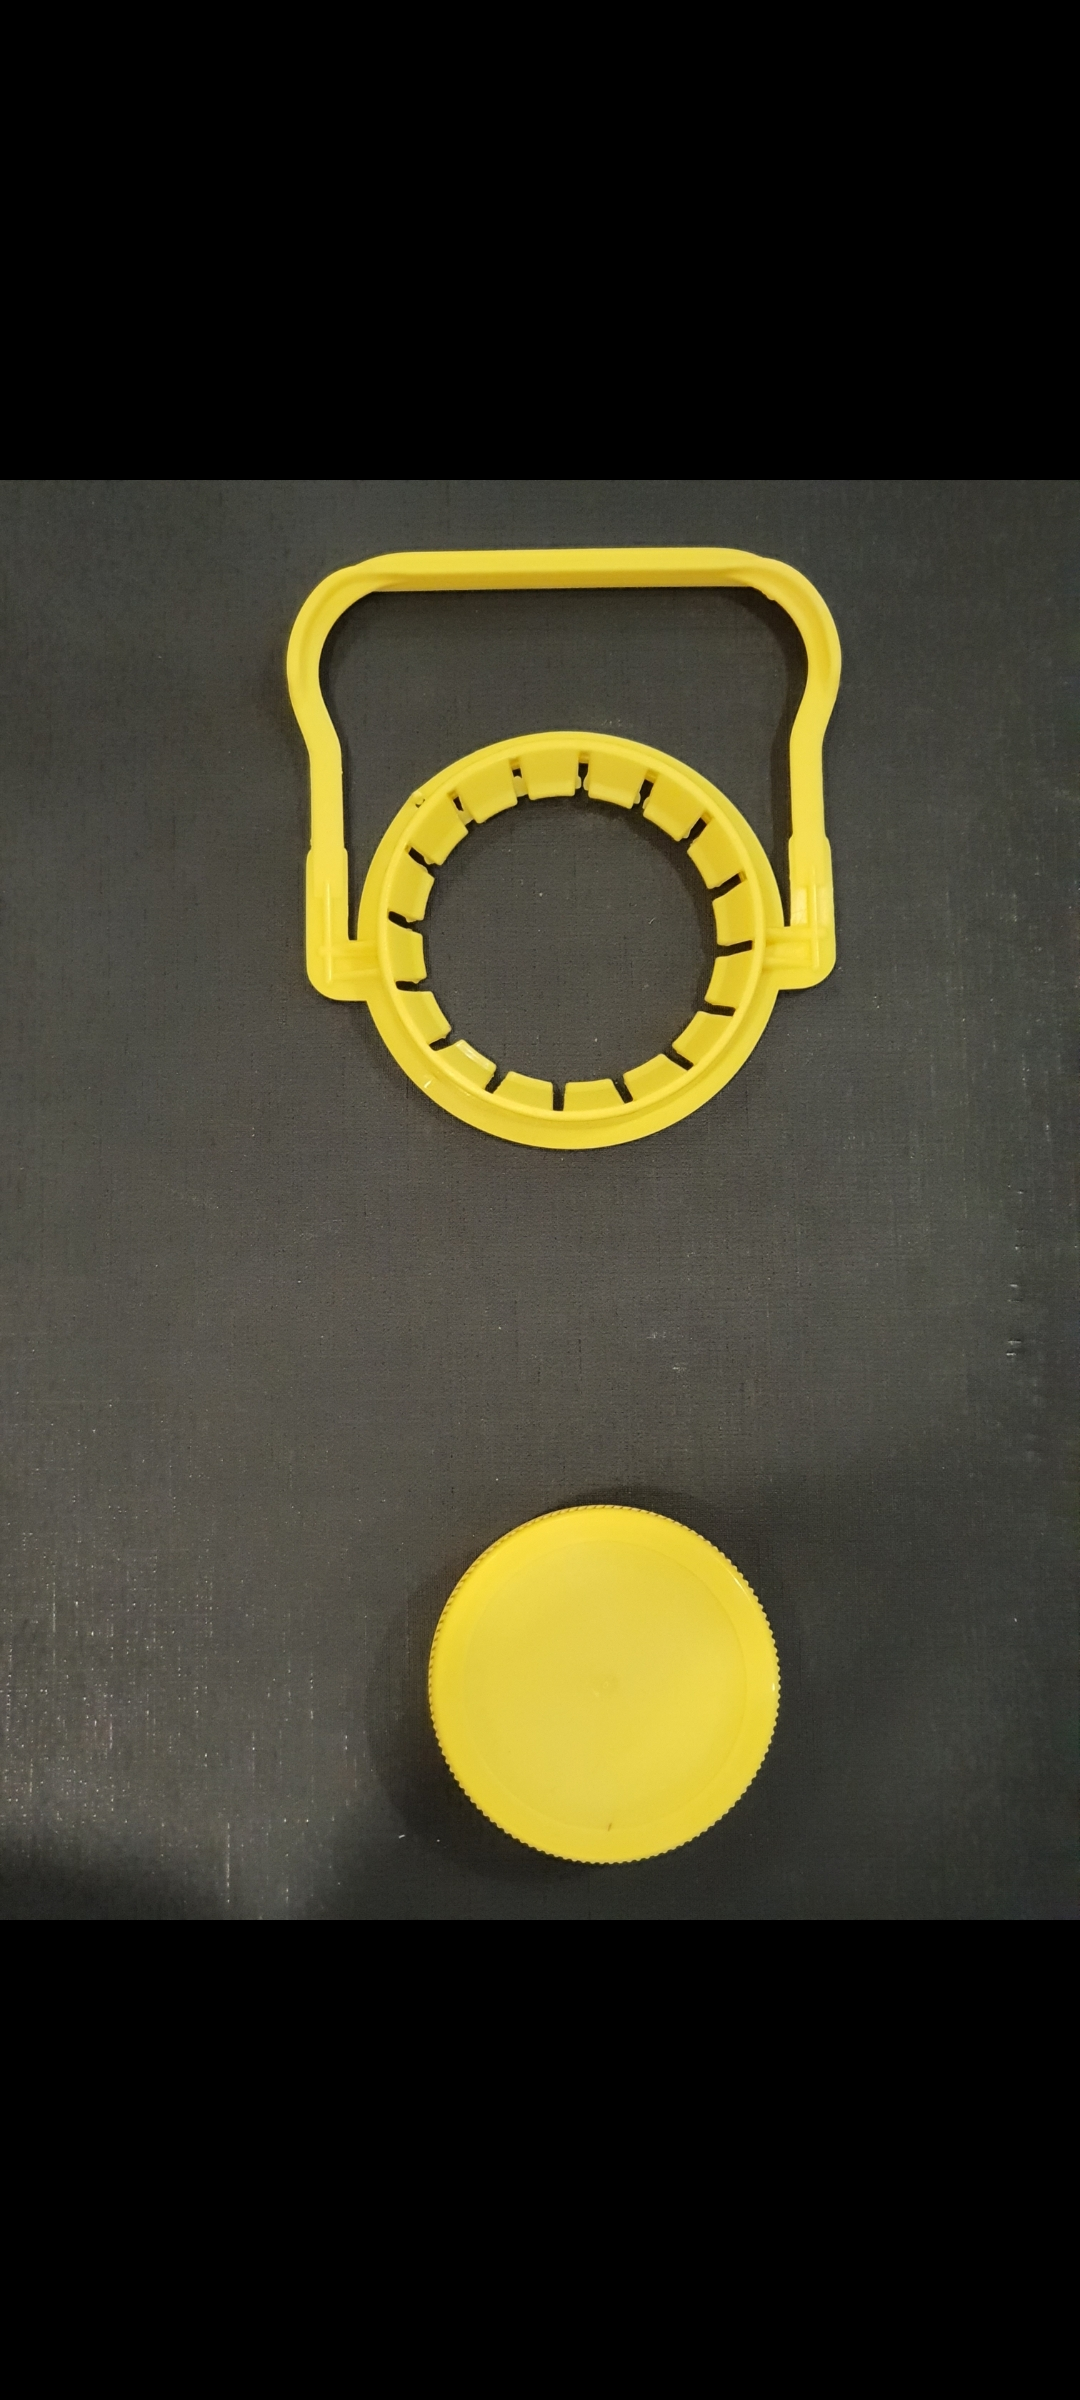 48mm plastic cap for pet bottles and handles